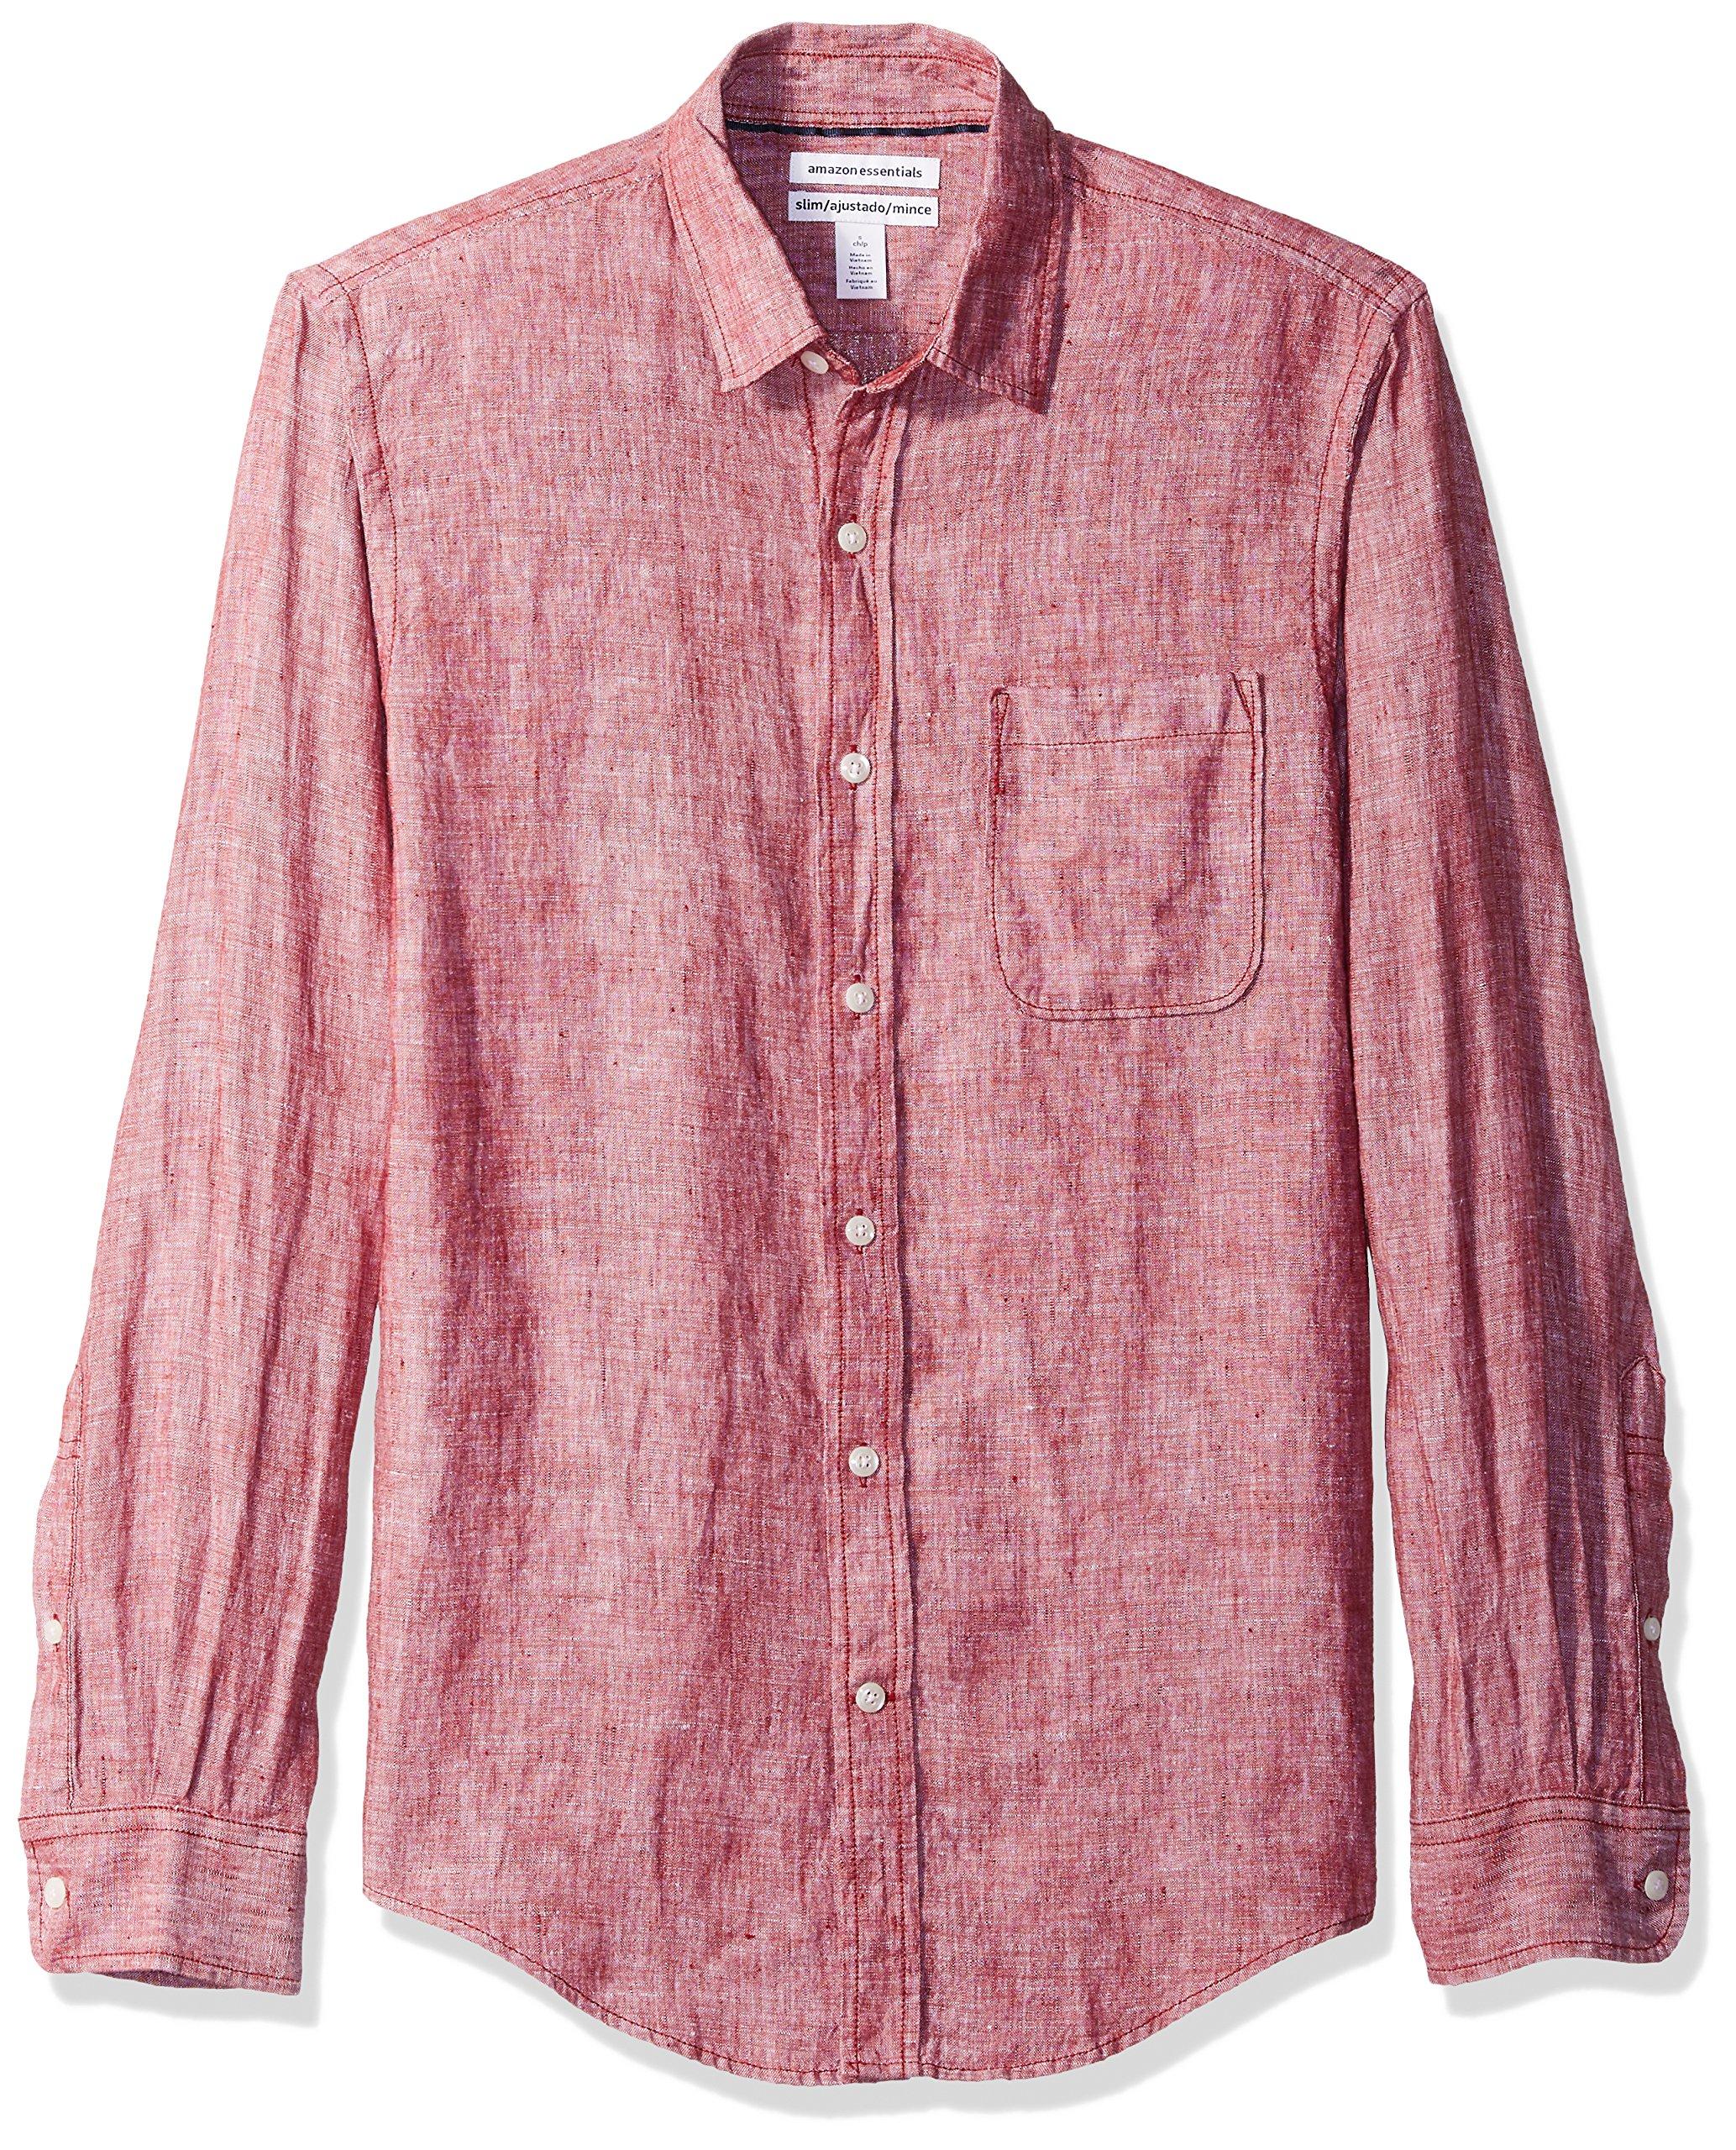 Amazon Essentials Men's Slim-Fit Long-Sleeve Linen Shirt, Red, Medium